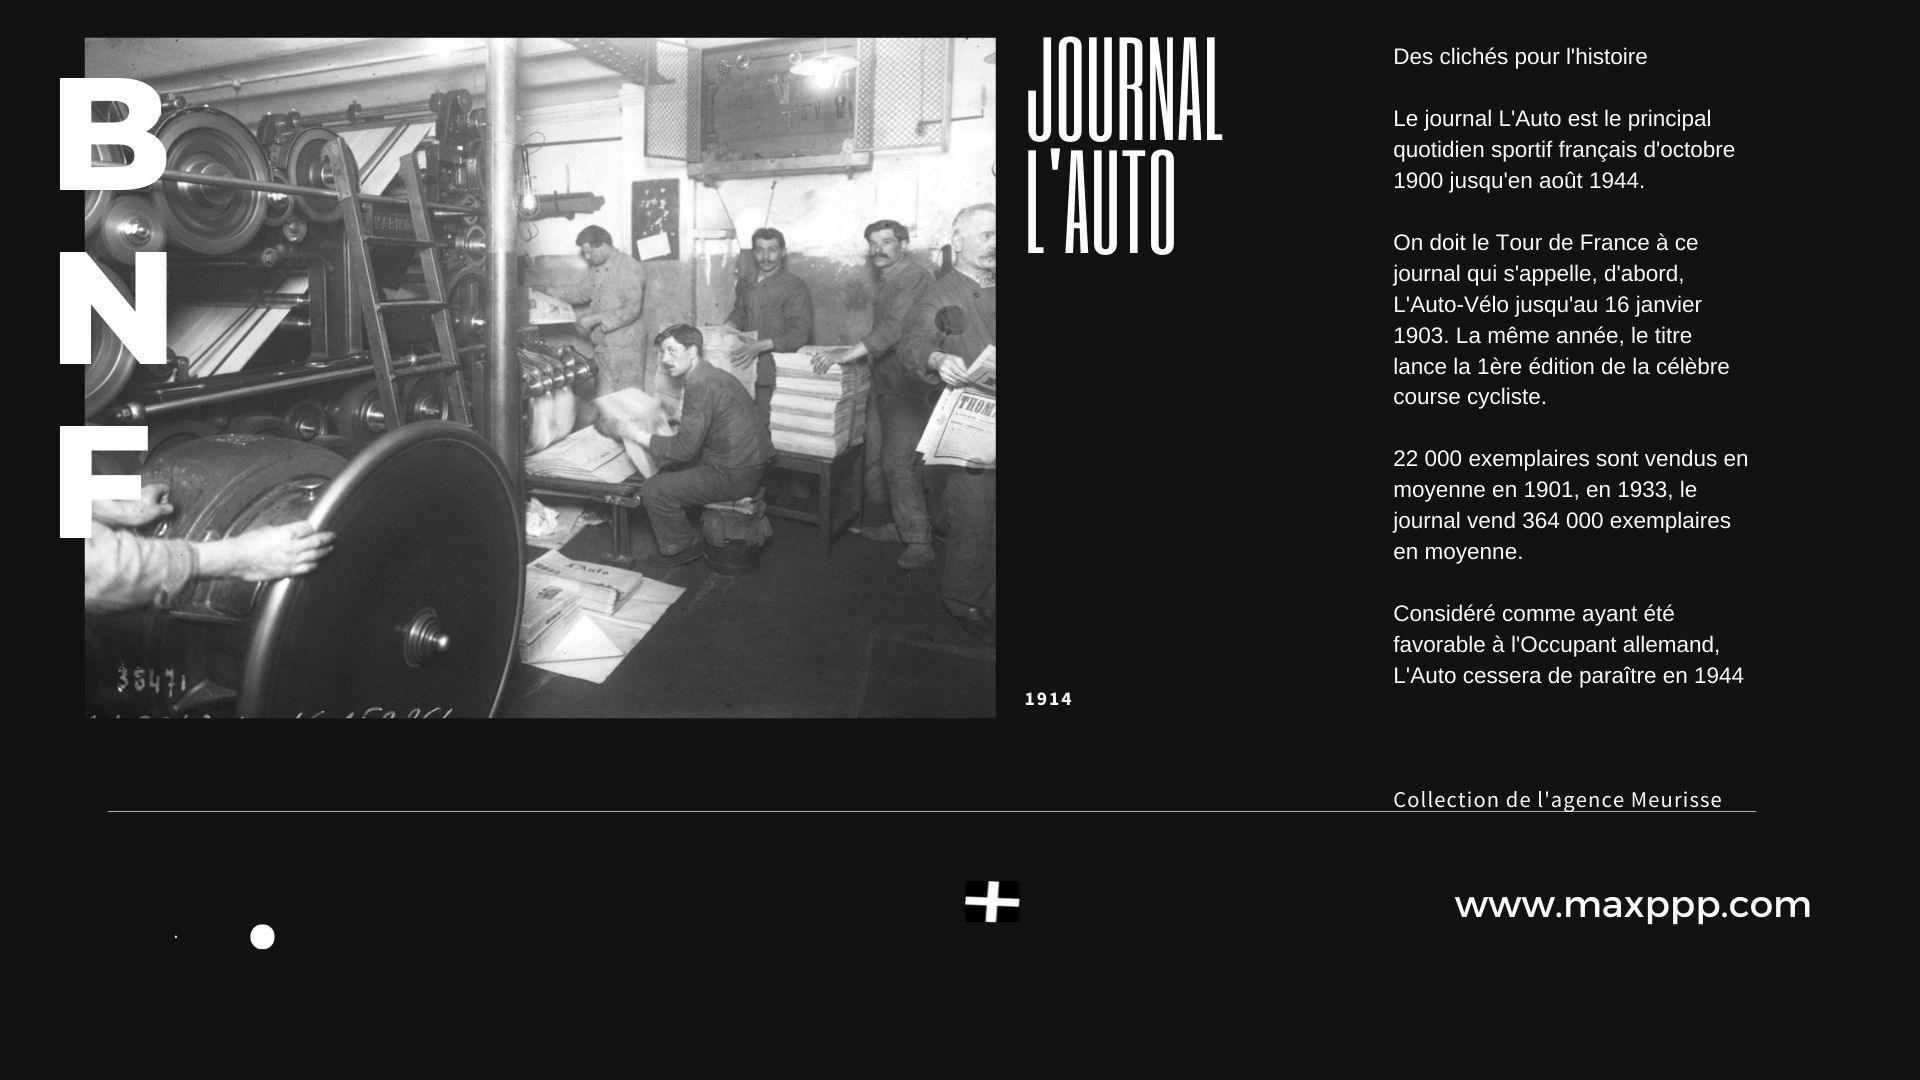 Journal l'Auto